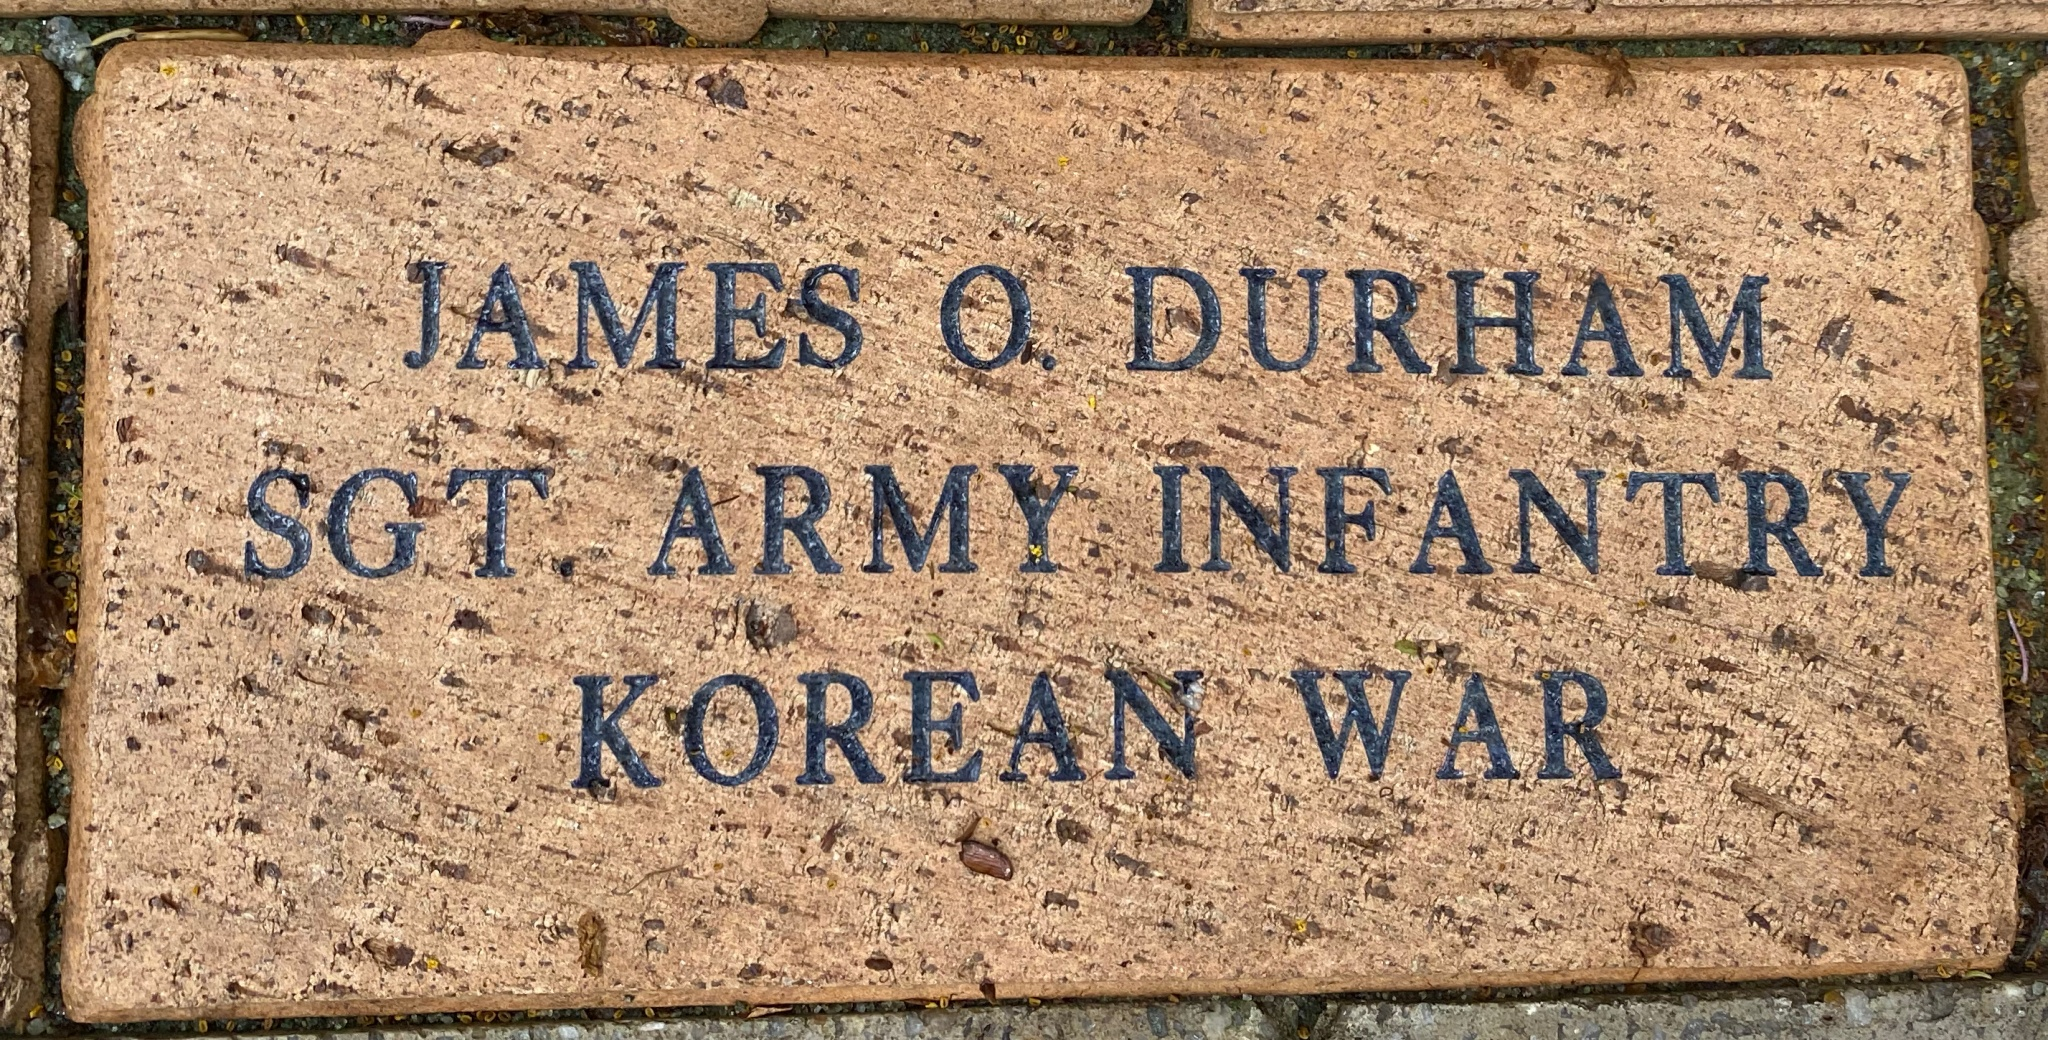 JAMES O. DURHAM SGT. ARMY INFANTRY KOREAN WAR